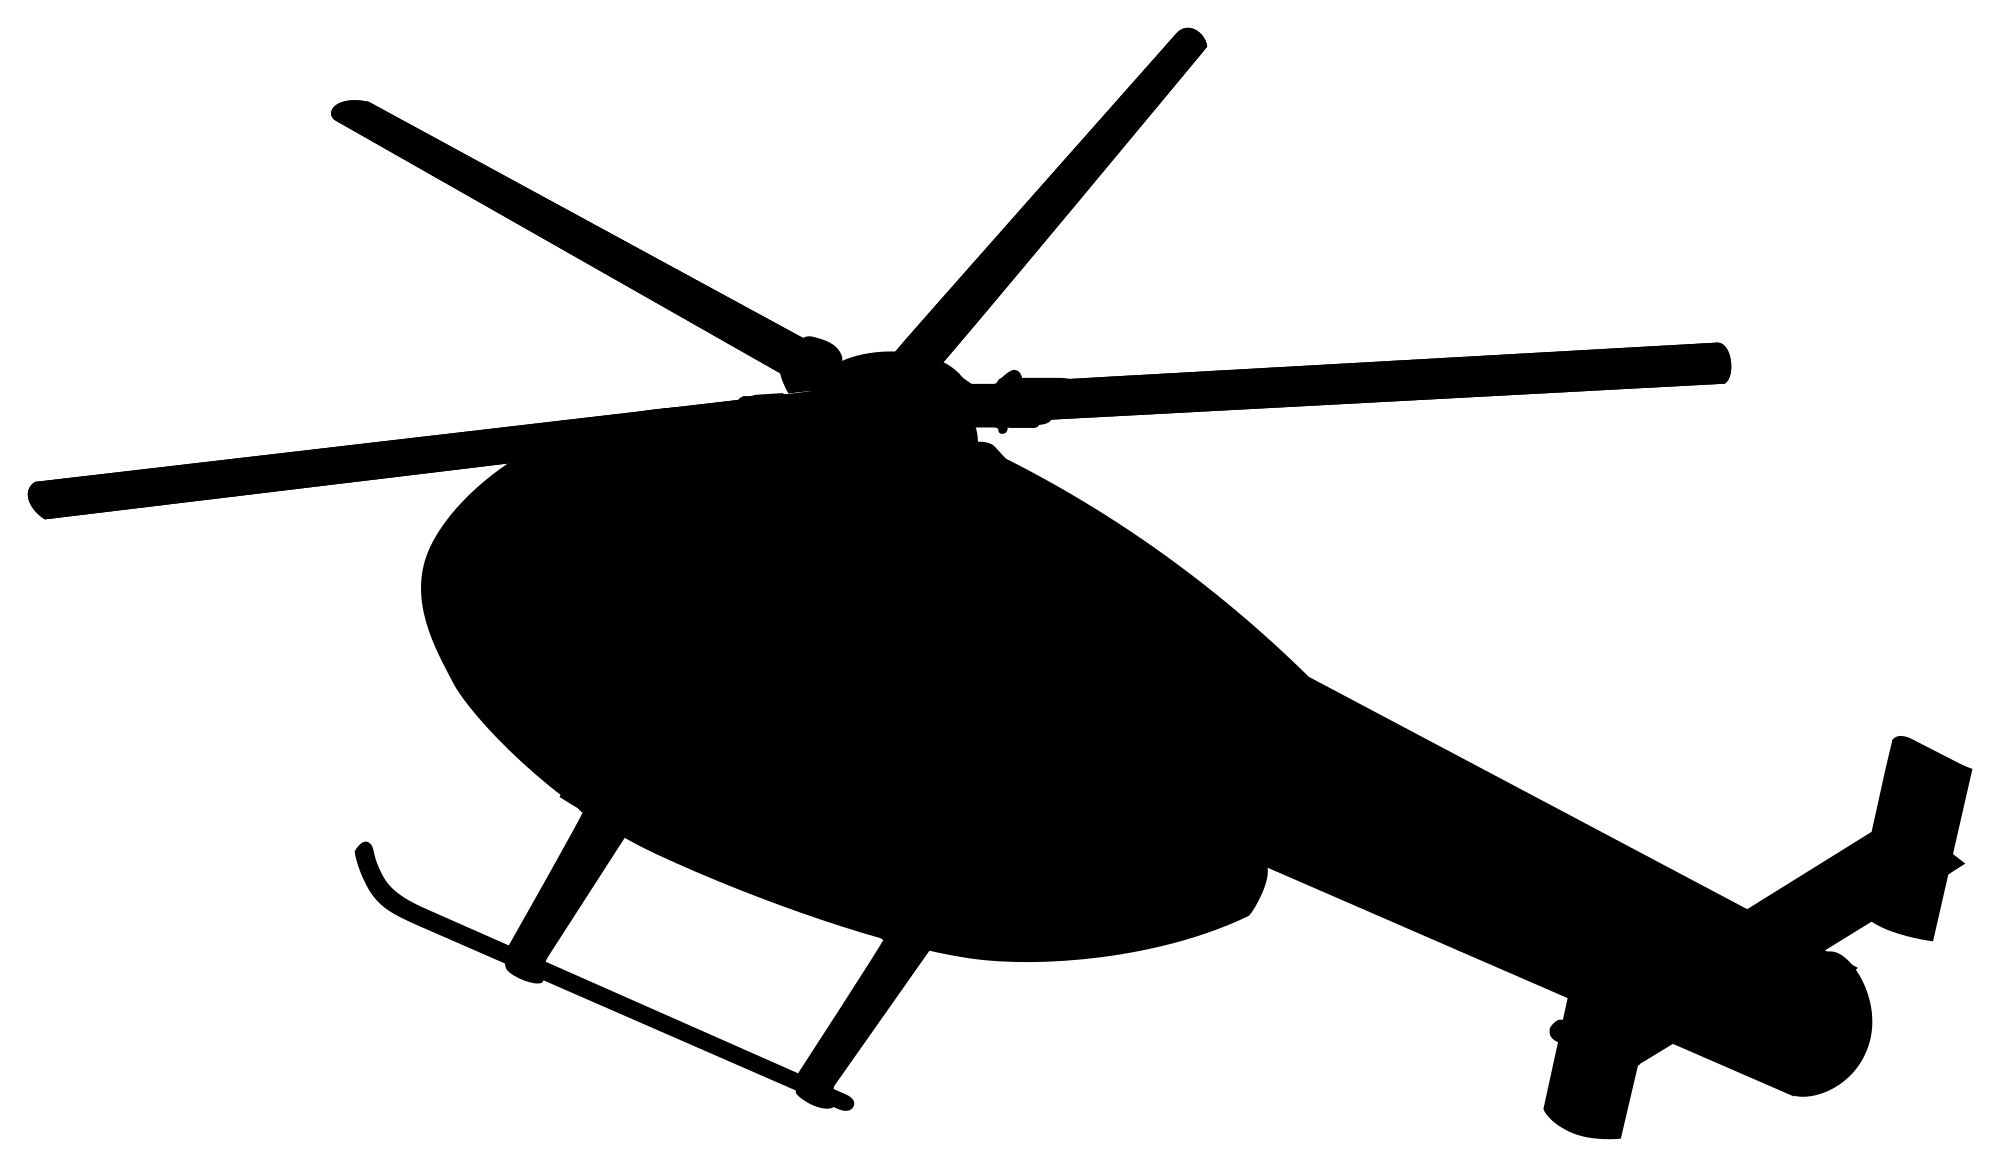 2000x1167 Filehelico Silhouette.svg